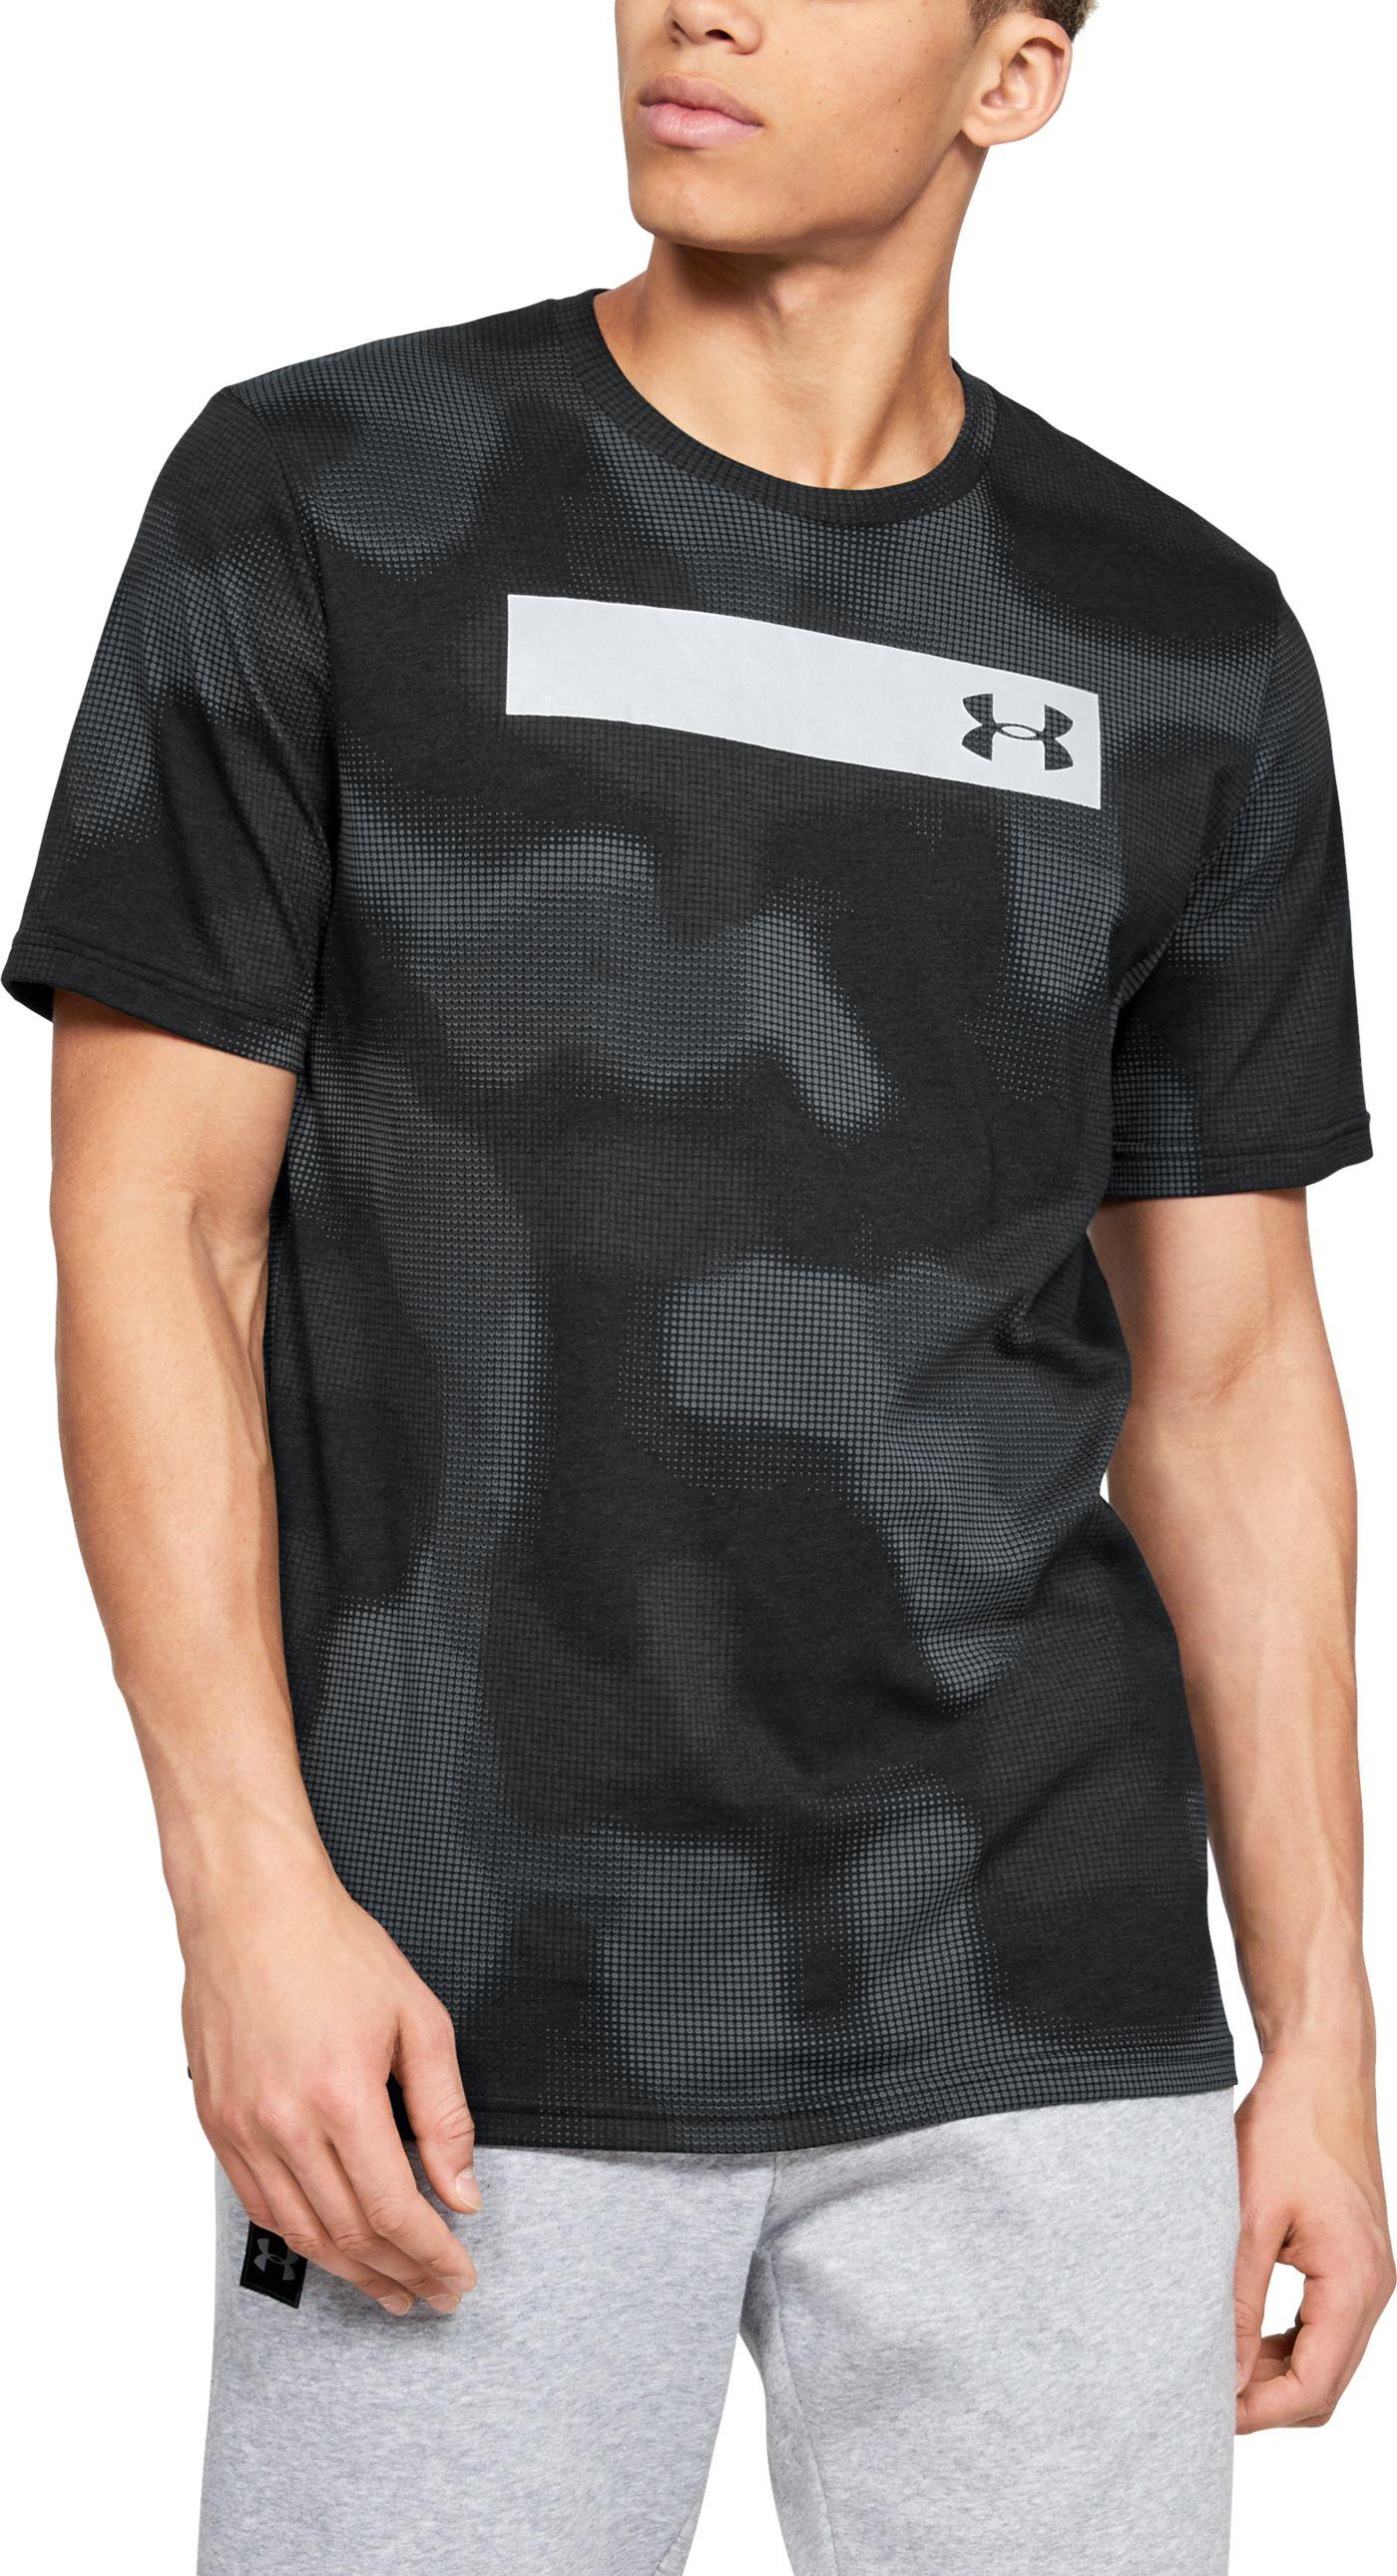 Under Armour Men's Printed Bar T-Shirt